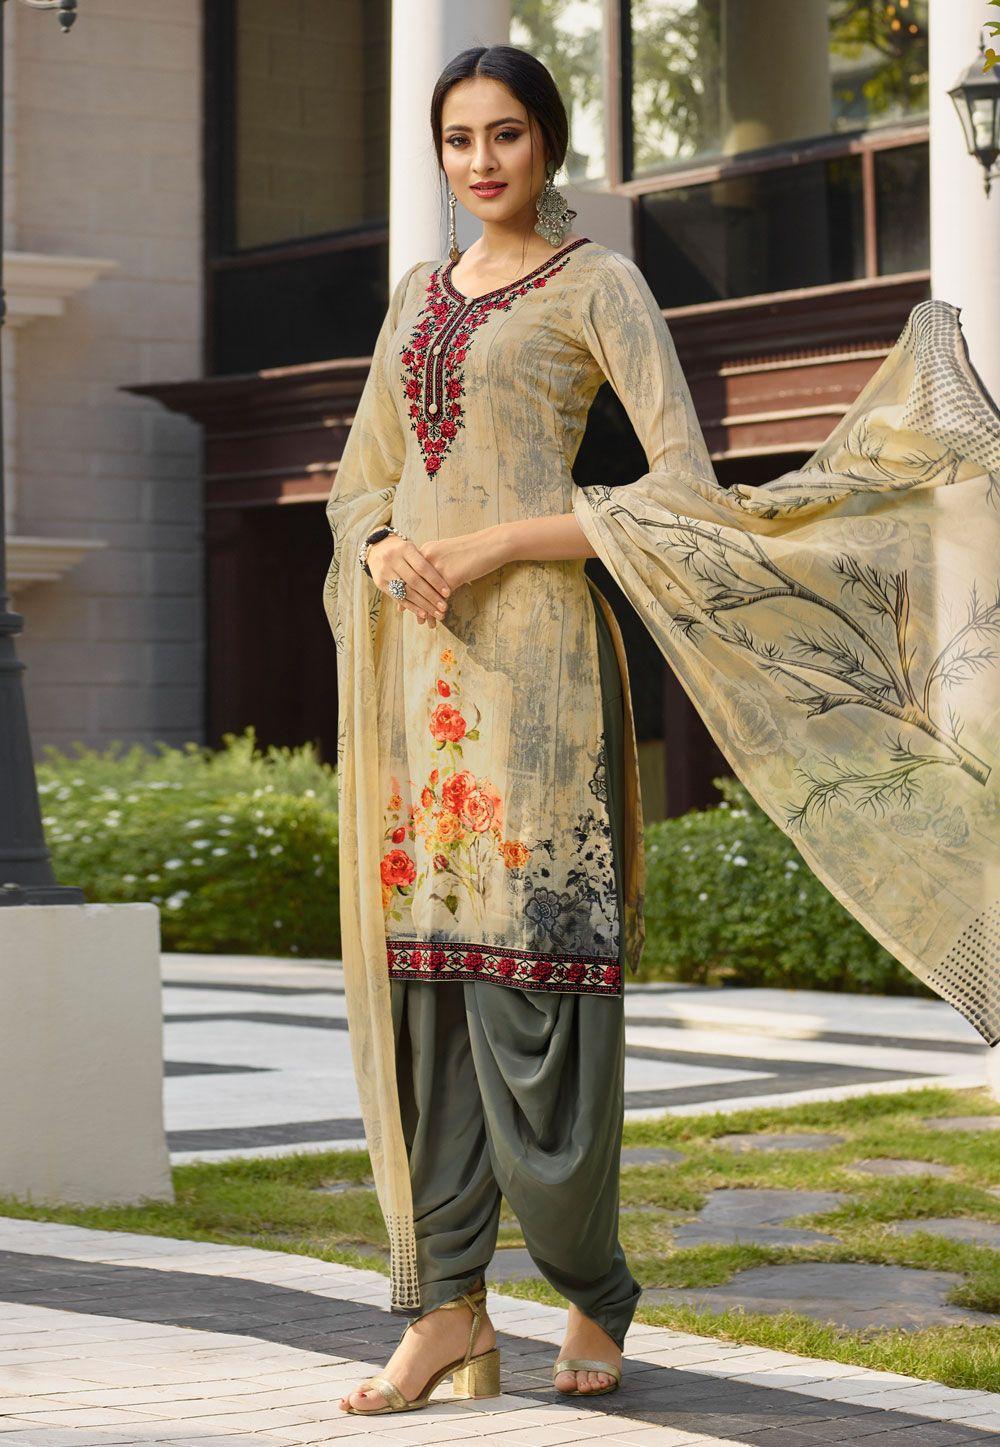 1c71197d49 Buy Beige Crepe Punjabi Suit 154442 online at lowest price from huge  collection of salwar kameez at Indianclothstore.com.